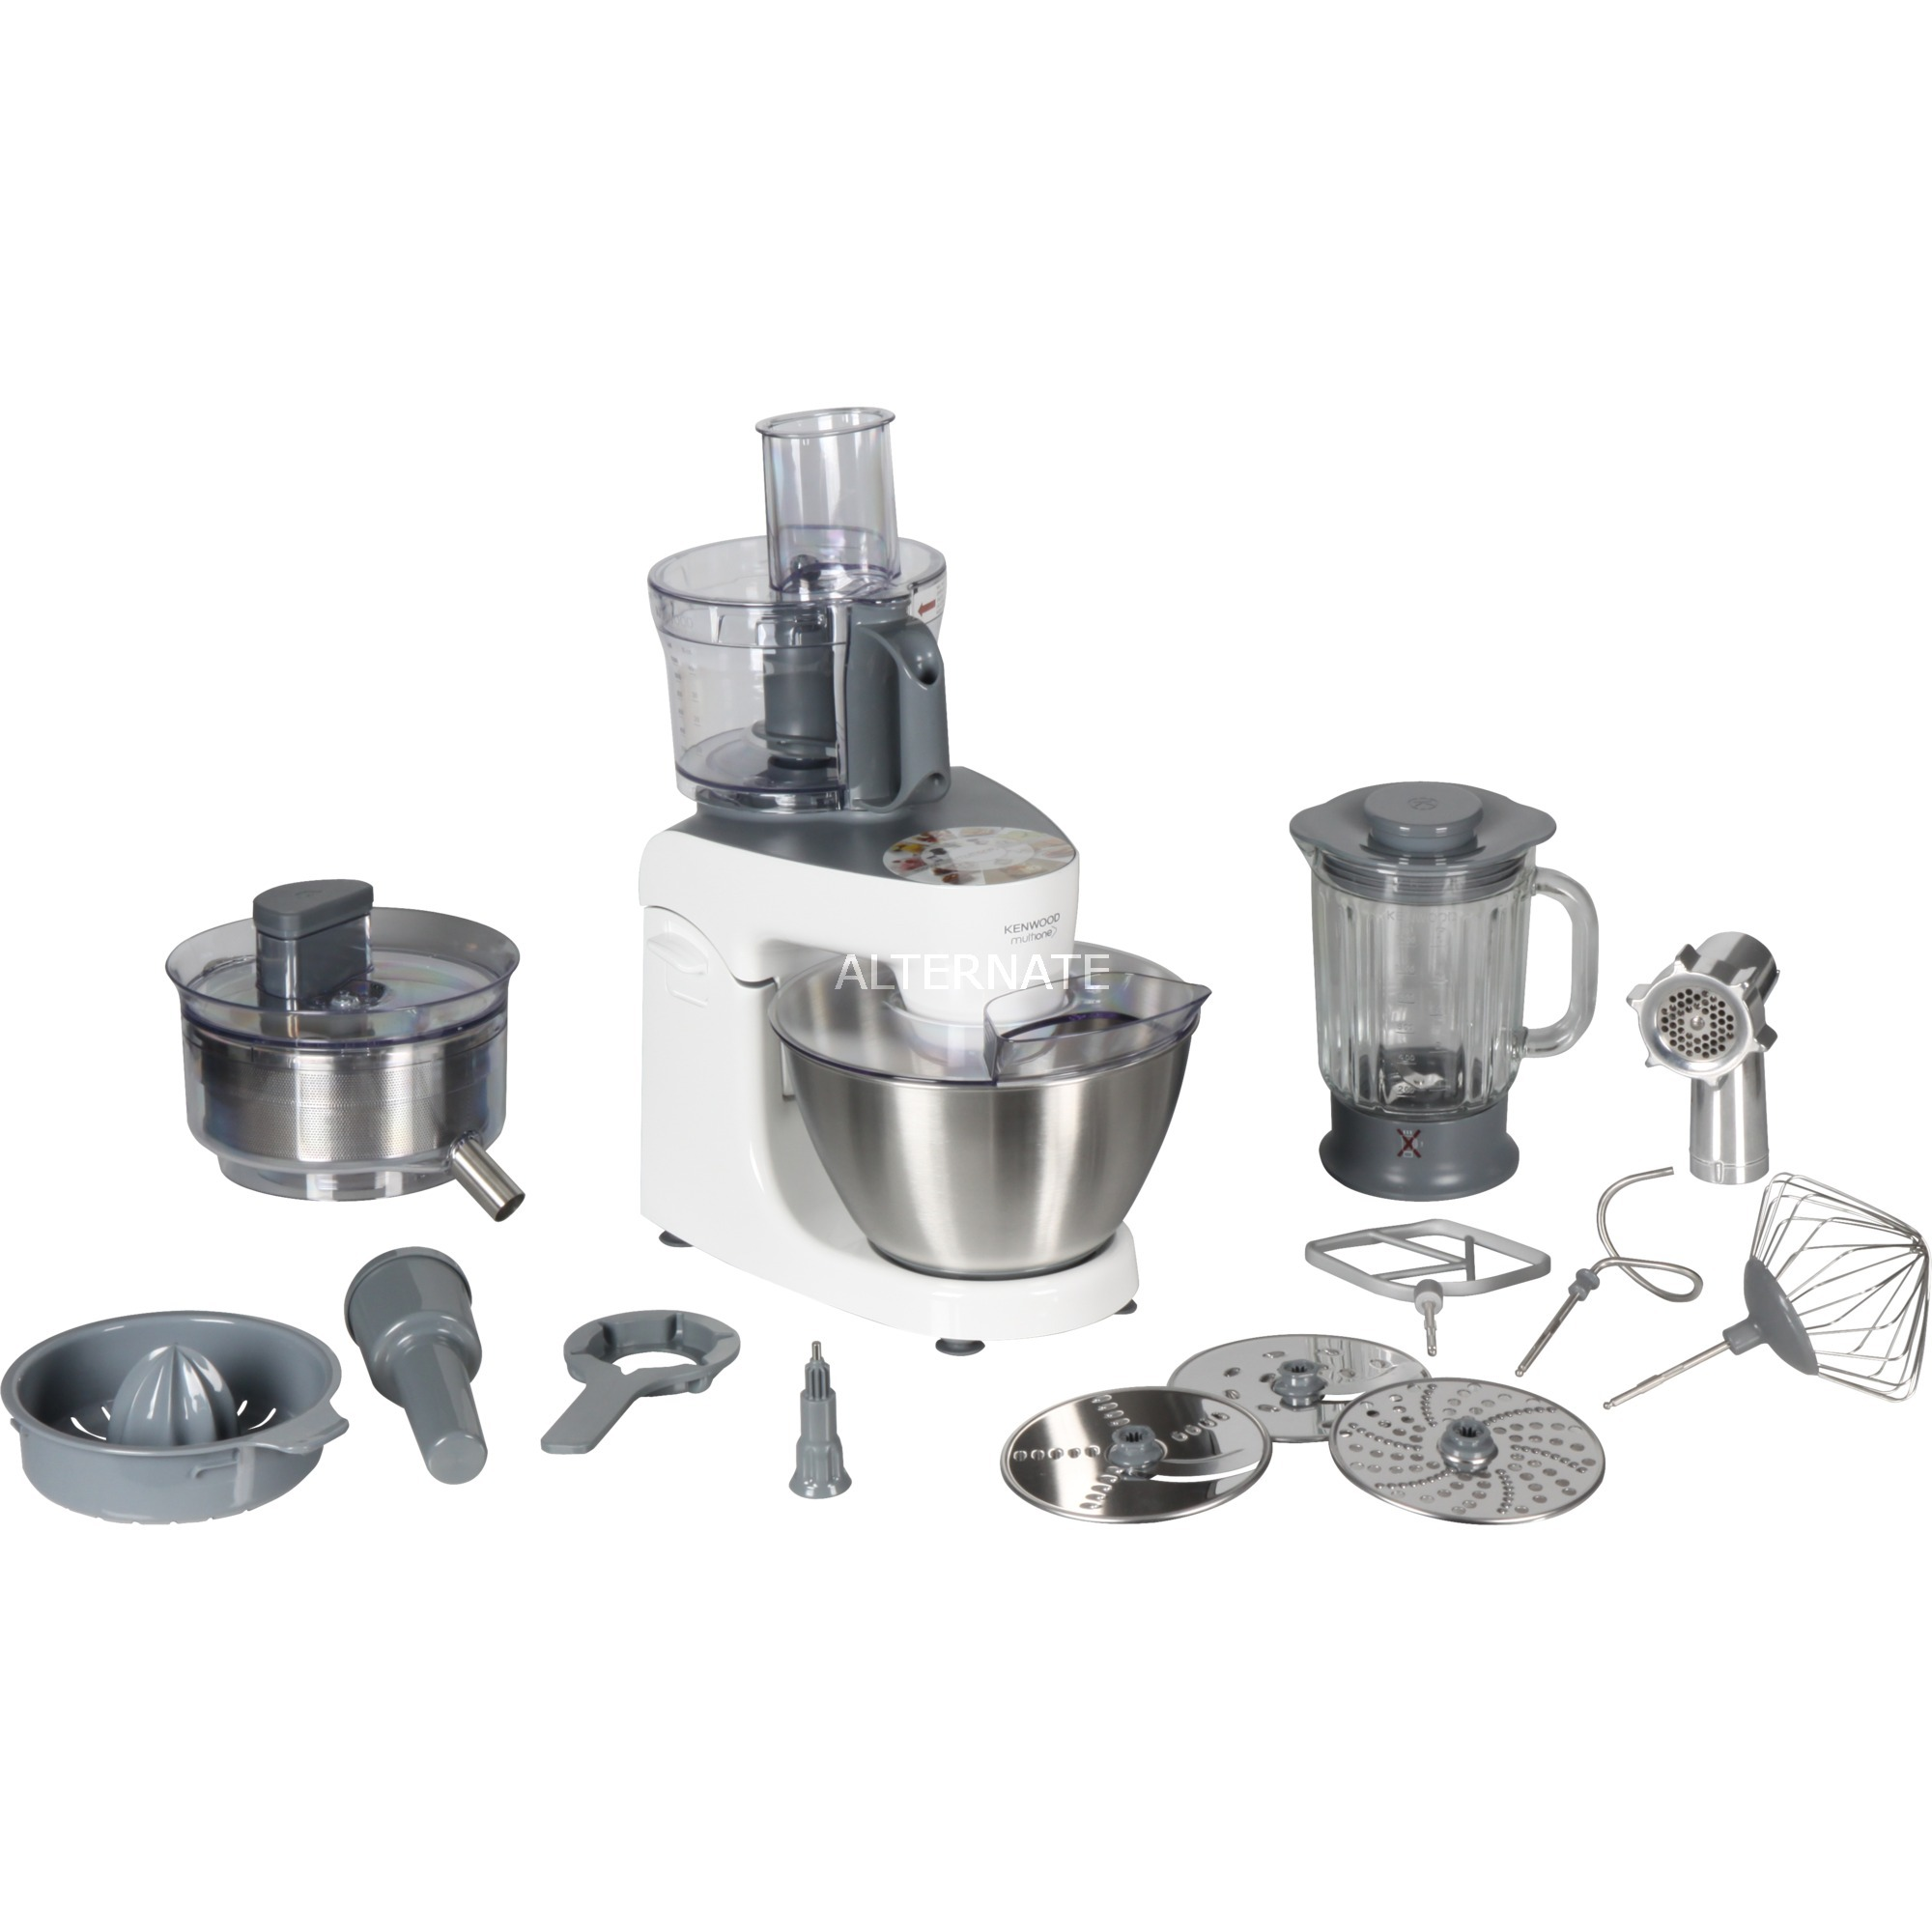 MultiOne robot da cucina 4,3 L Argento, Bianco 1000 W (bianco, 4,3 L,  Argento, Bianco, Manopola, Acciaio inossidabile, 1000 W, 290 mm)